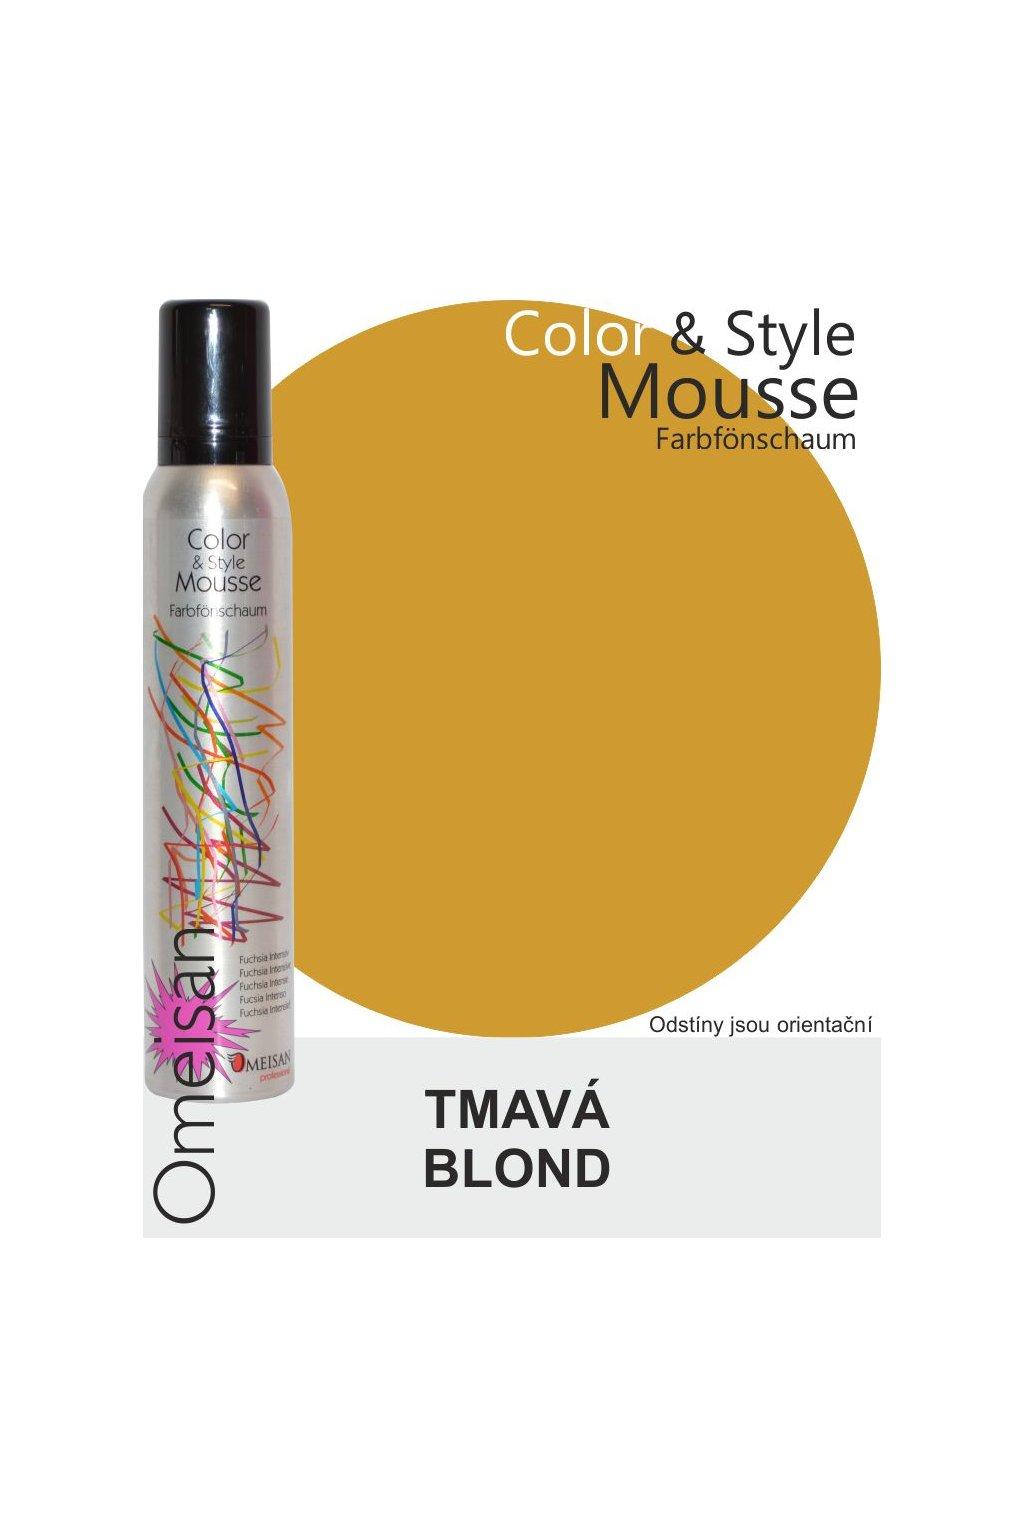 6446 omeisan barevna pena tuzici dunkelblond 200ml tmava blond